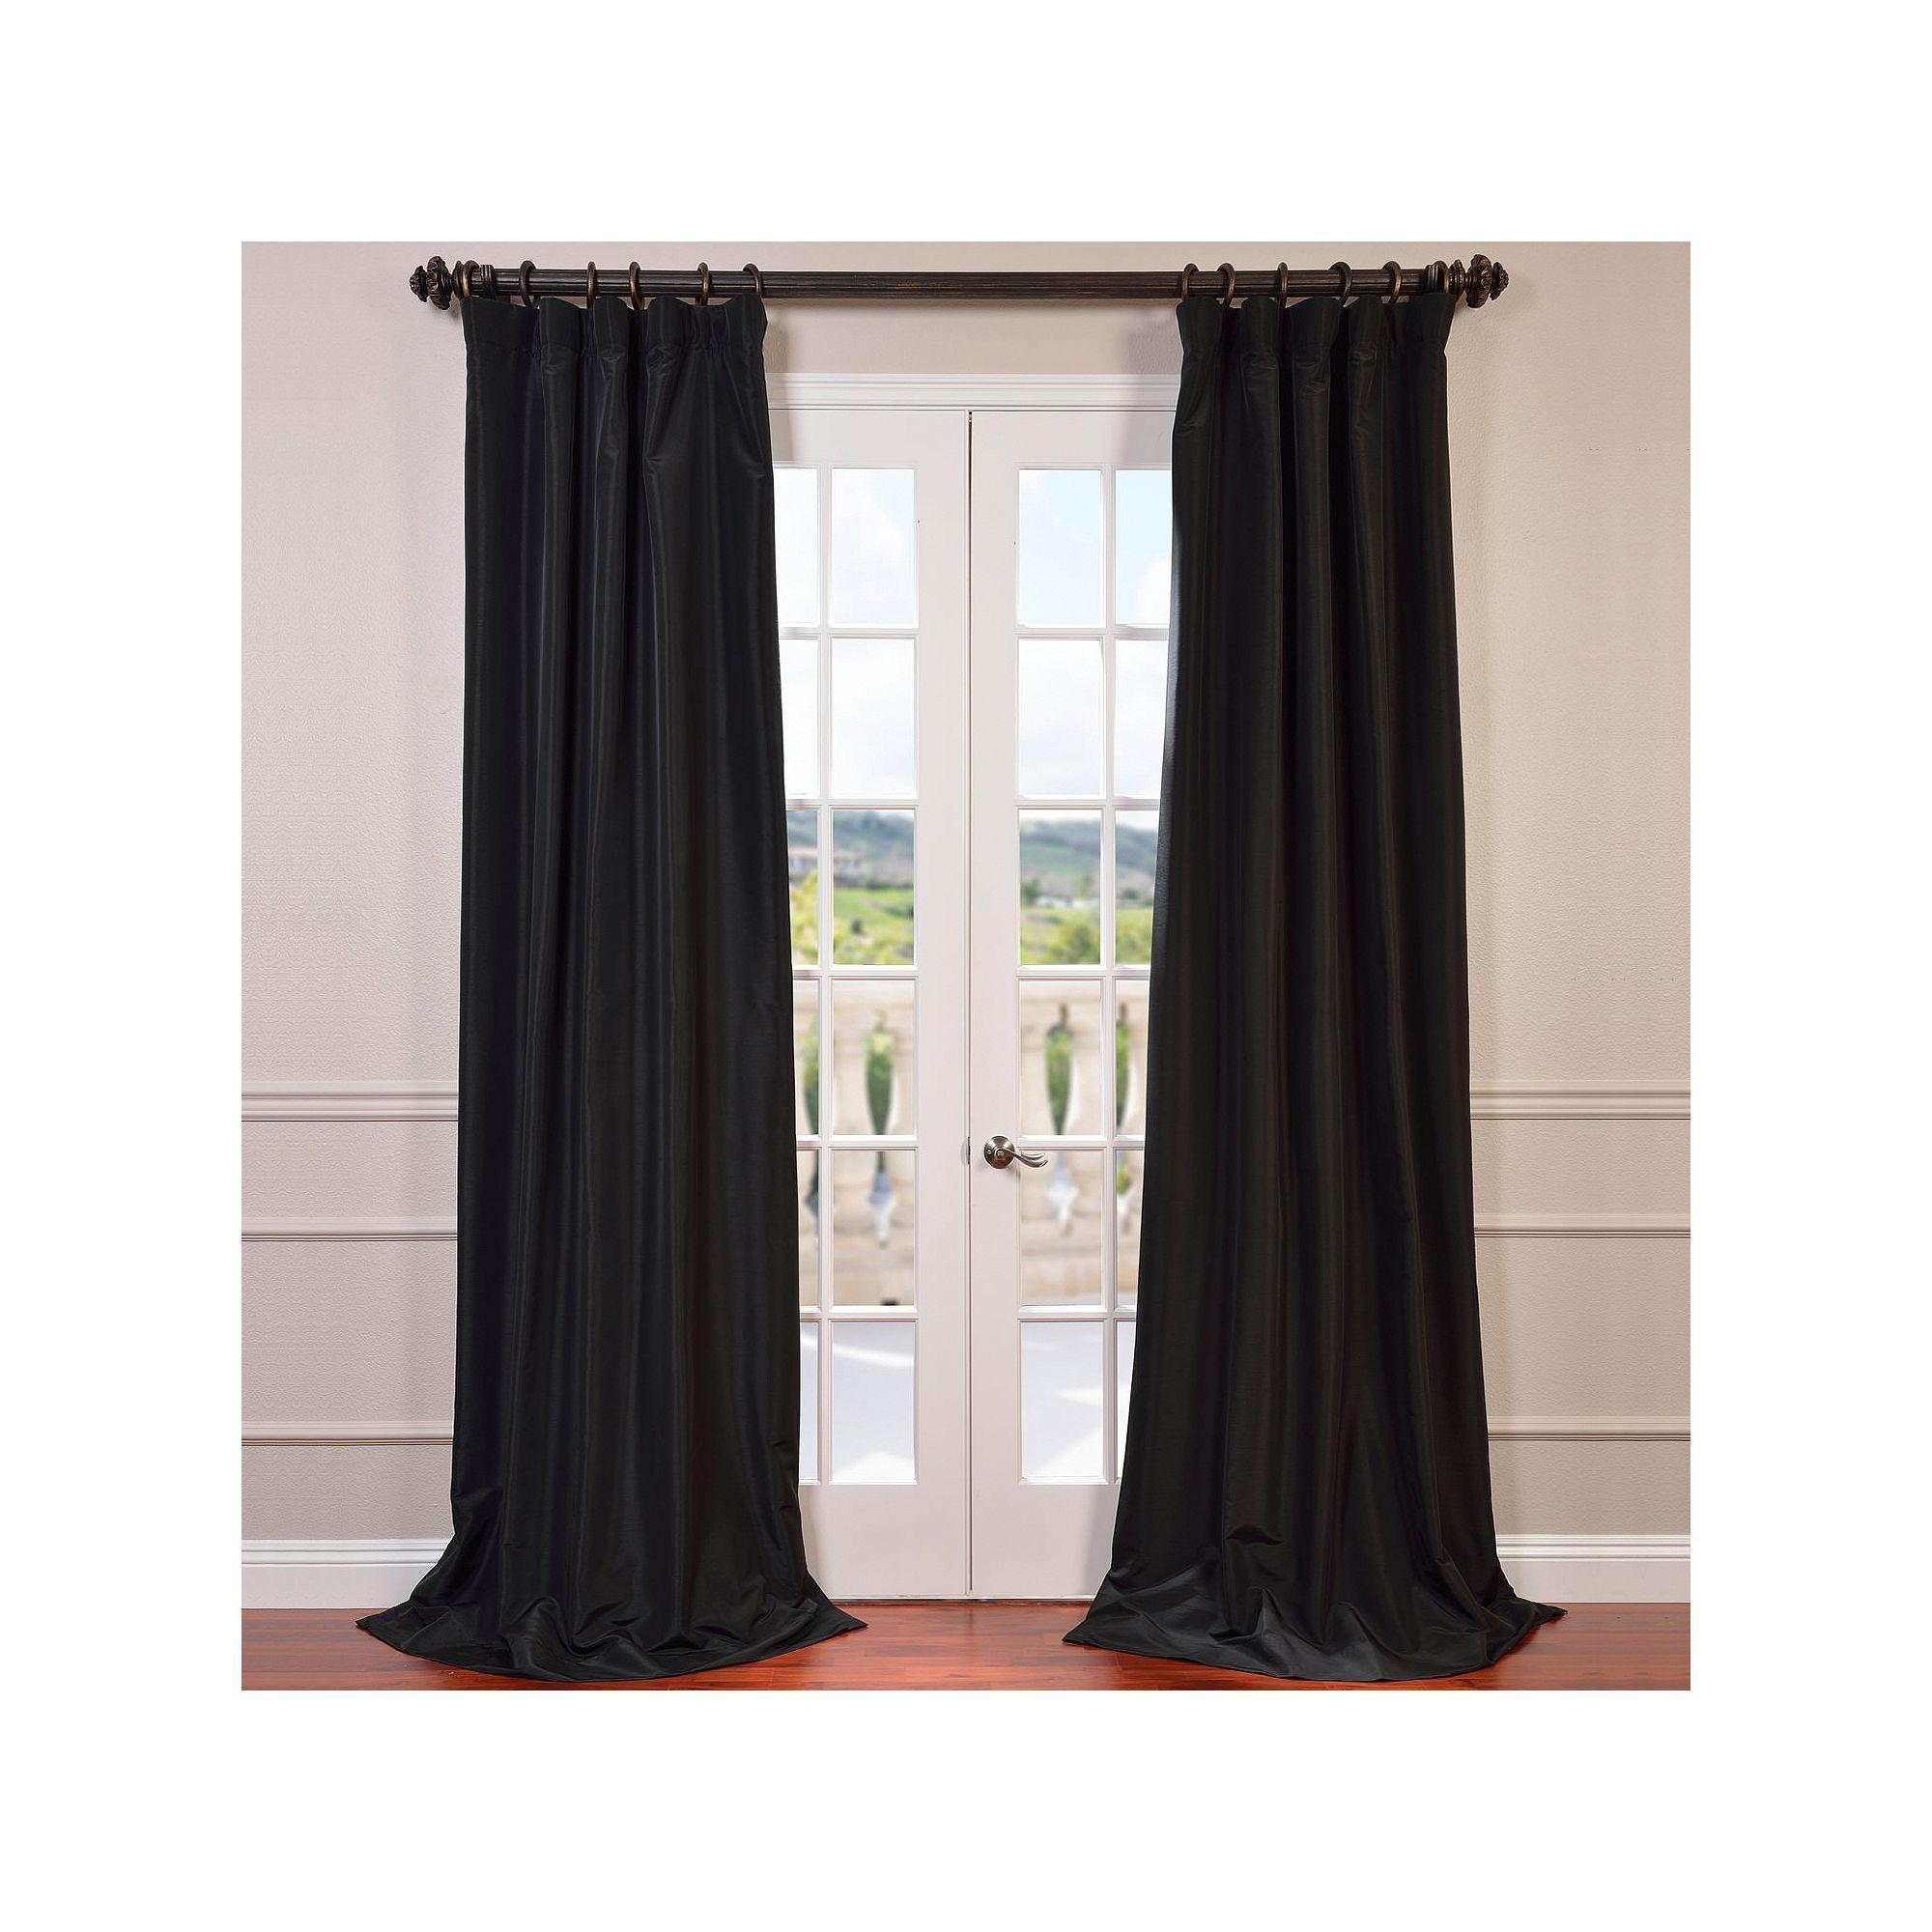 Eff Blackout 1 Panel Faux Silk Taffeta Window Curtain Within Faux Silk Taffeta Solid Blackout Single Curtain Panels (View 15 of 20)